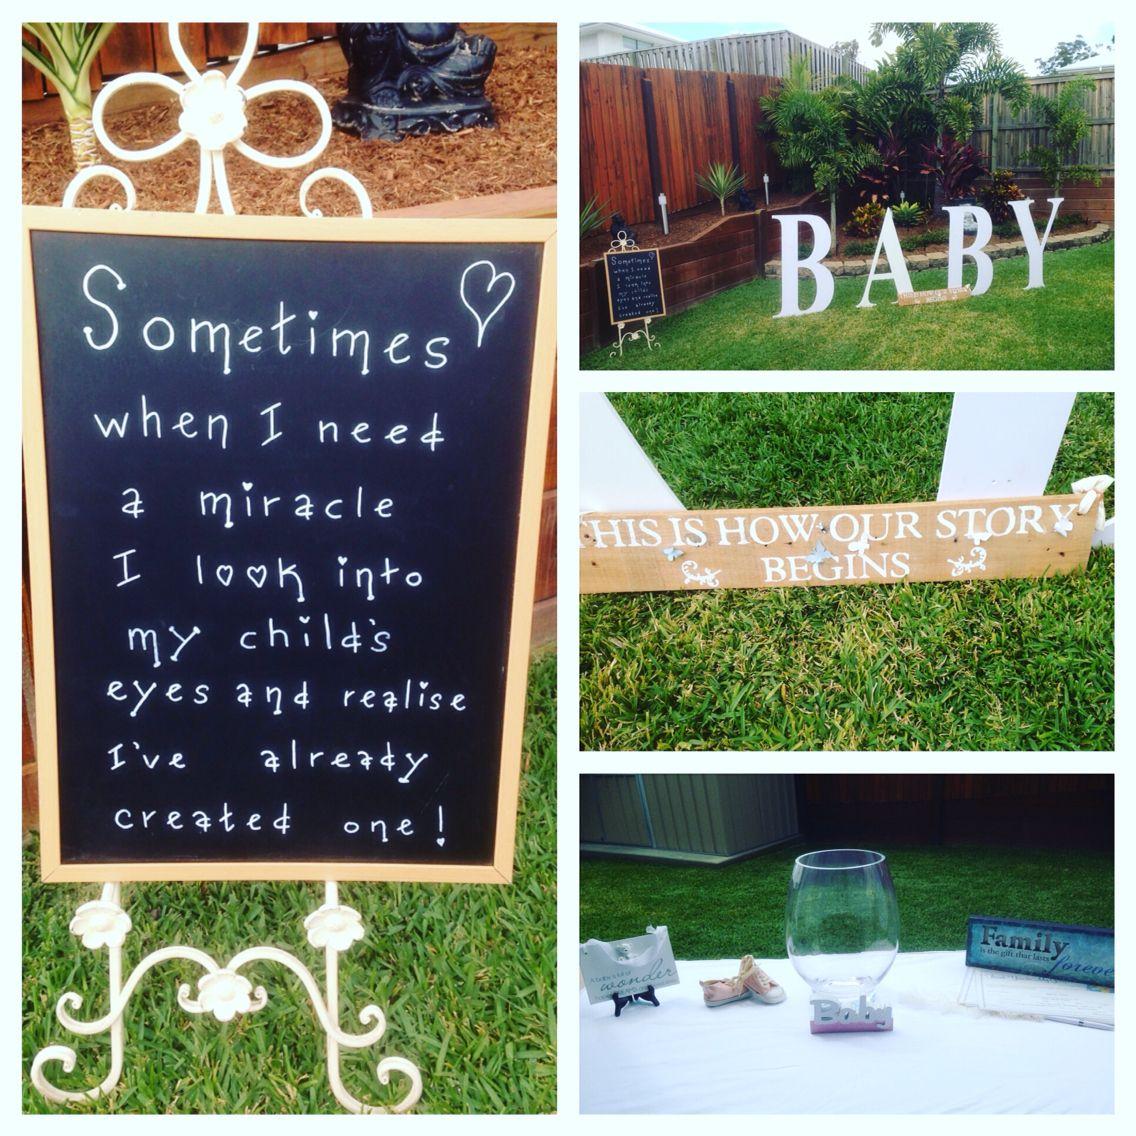 Naming ceremony in couples backyard